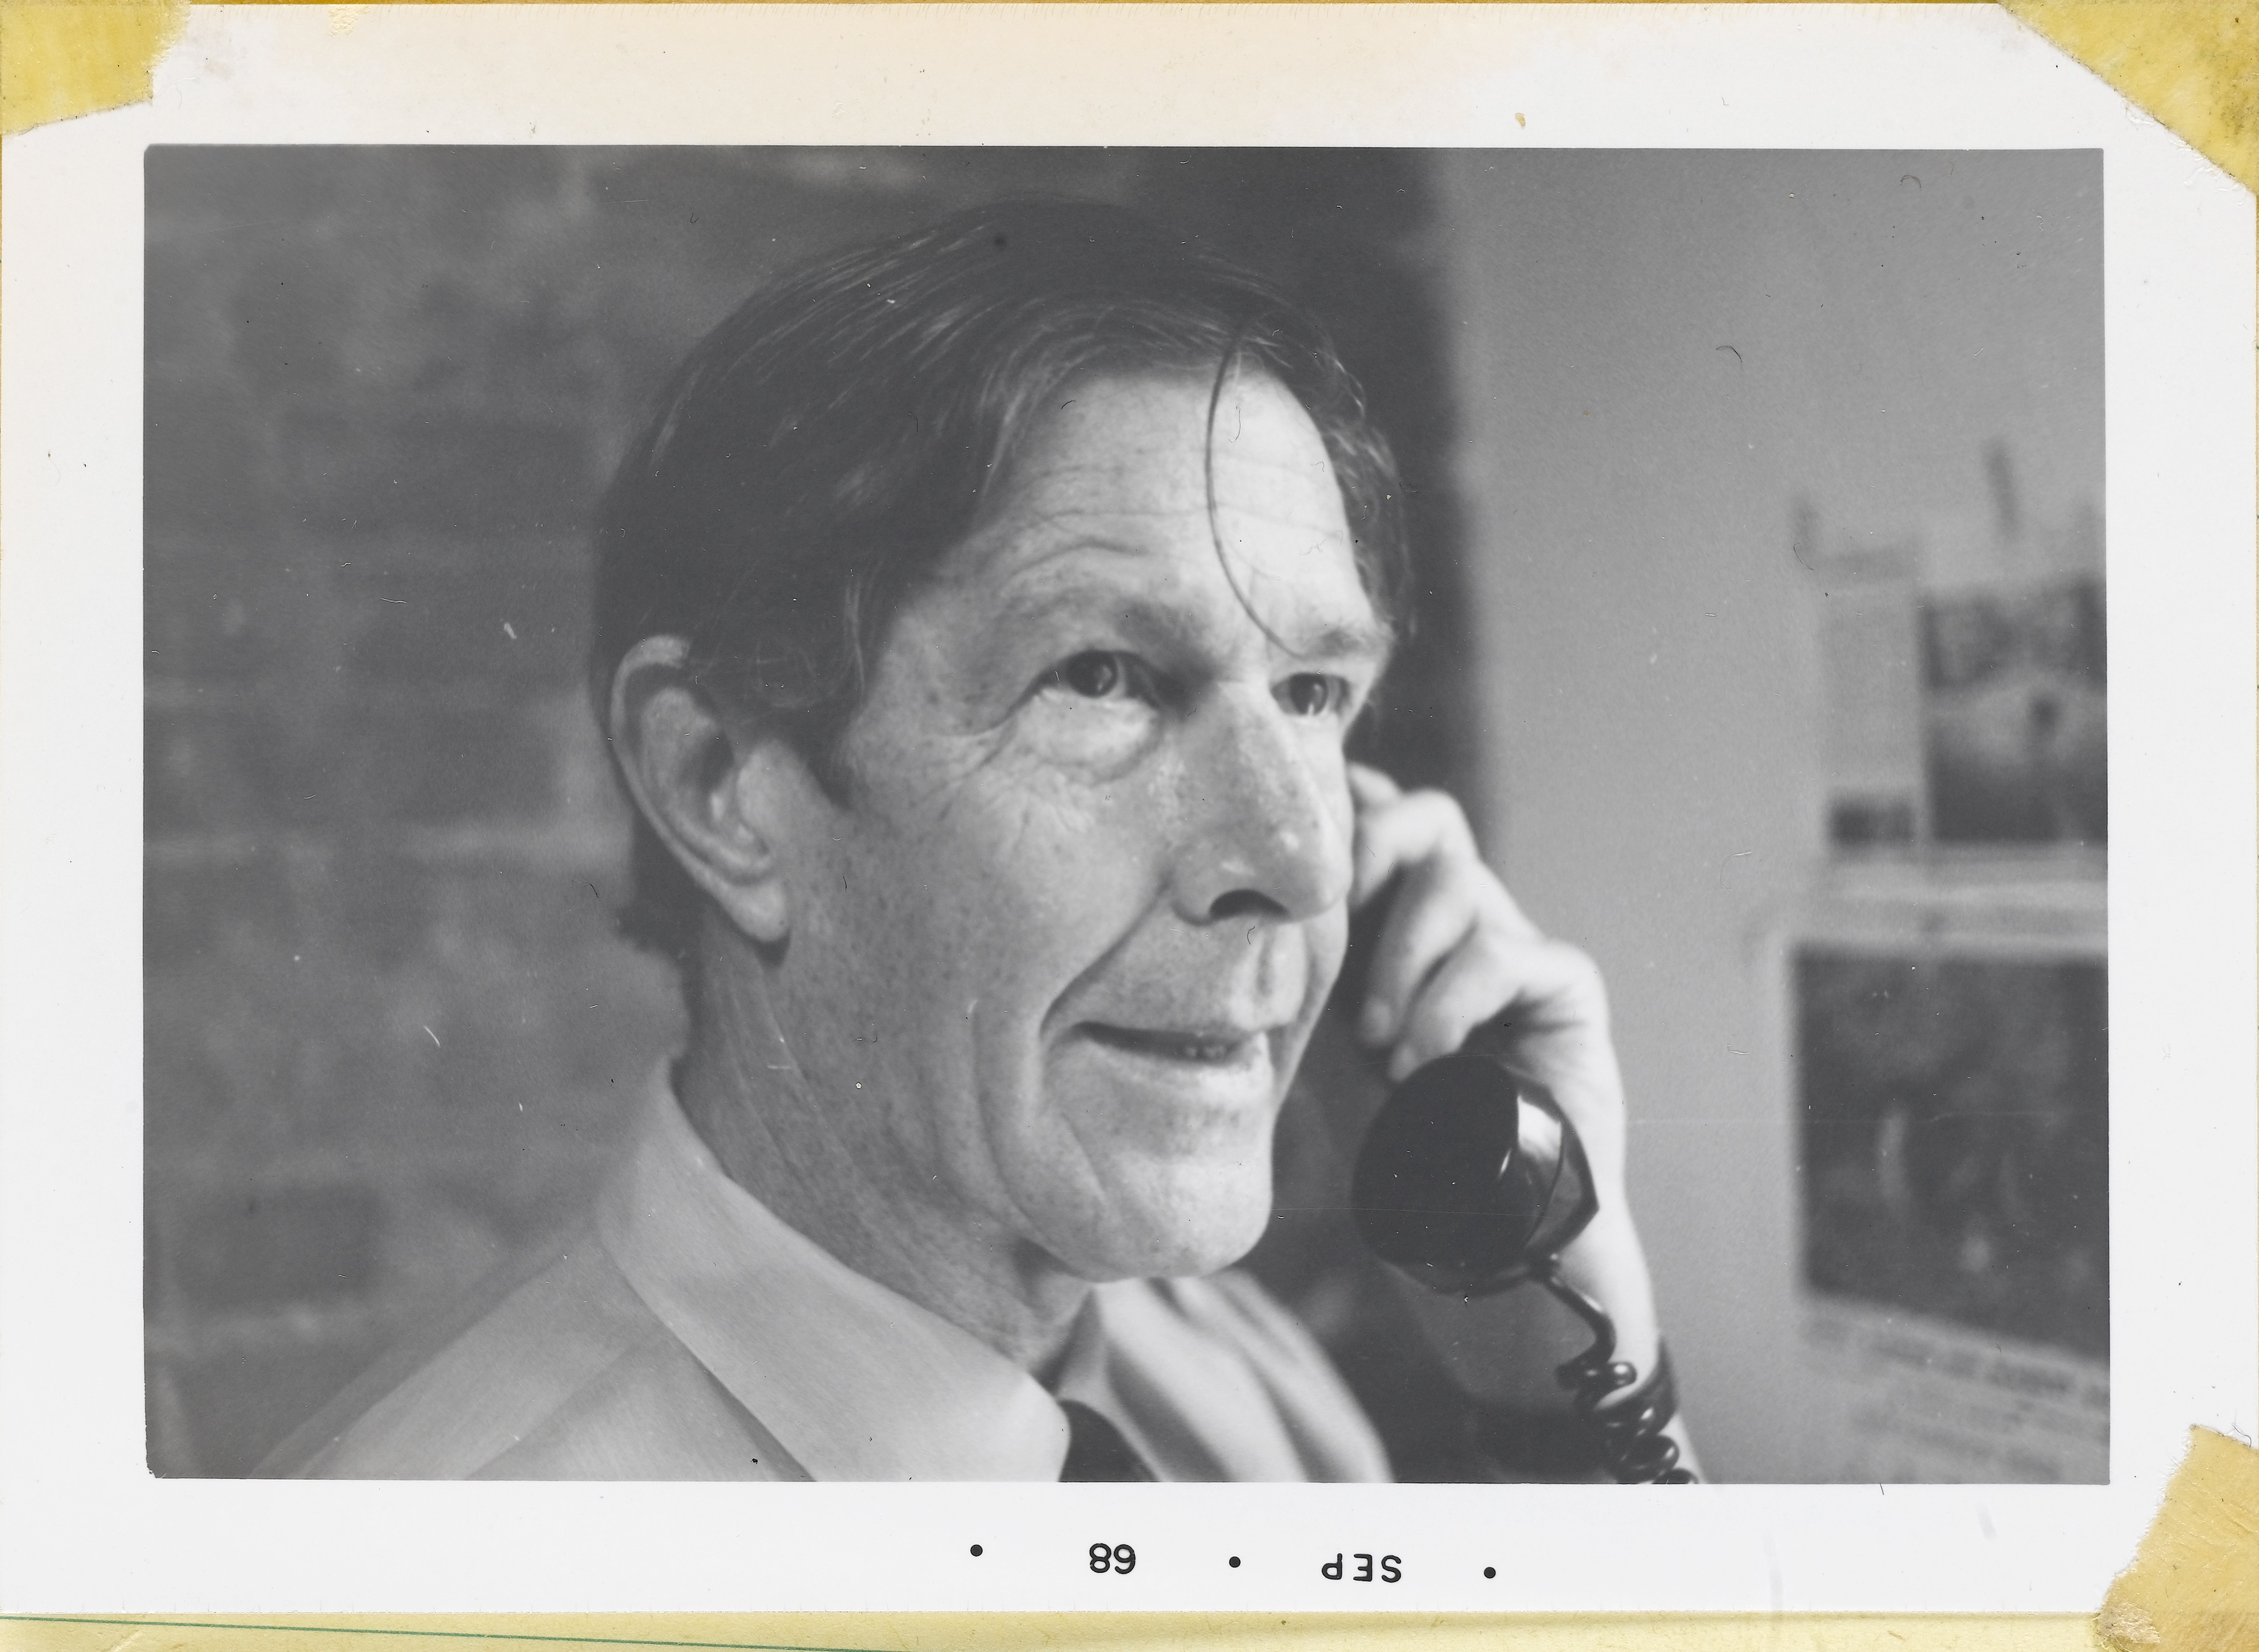 John Cage / Lois Long, Mud Book (Einzelseite), 1983, 12, - john_cage_foto_d_higgins